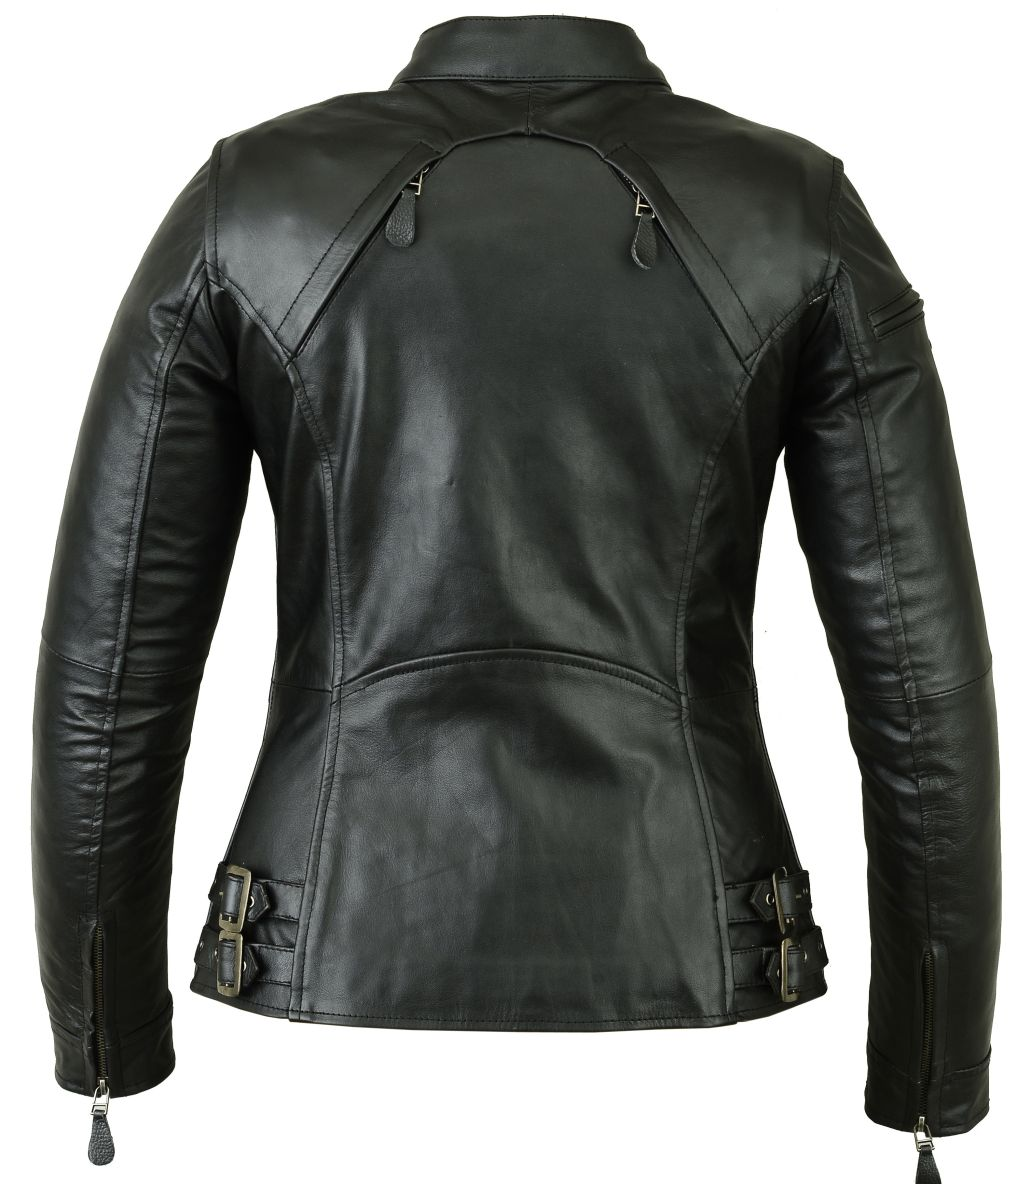 Bangla Damen Bikerstil Lederjacke Leder Jacke Schnallen schwarz S M L XL